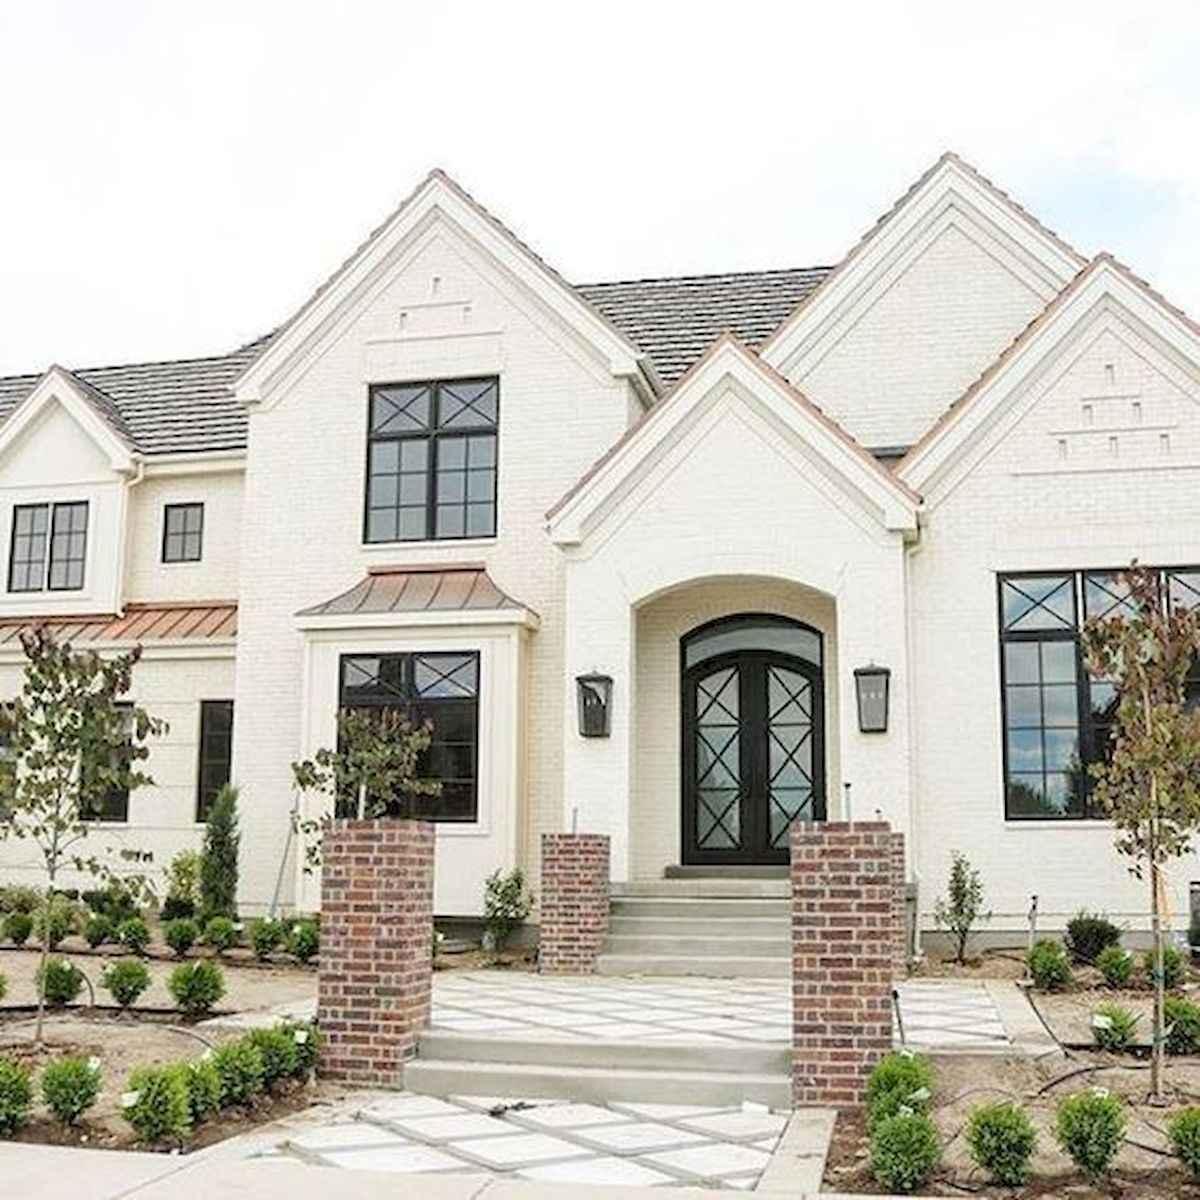 40 Fantastic Dream Home Exterior Design Ideas (38)